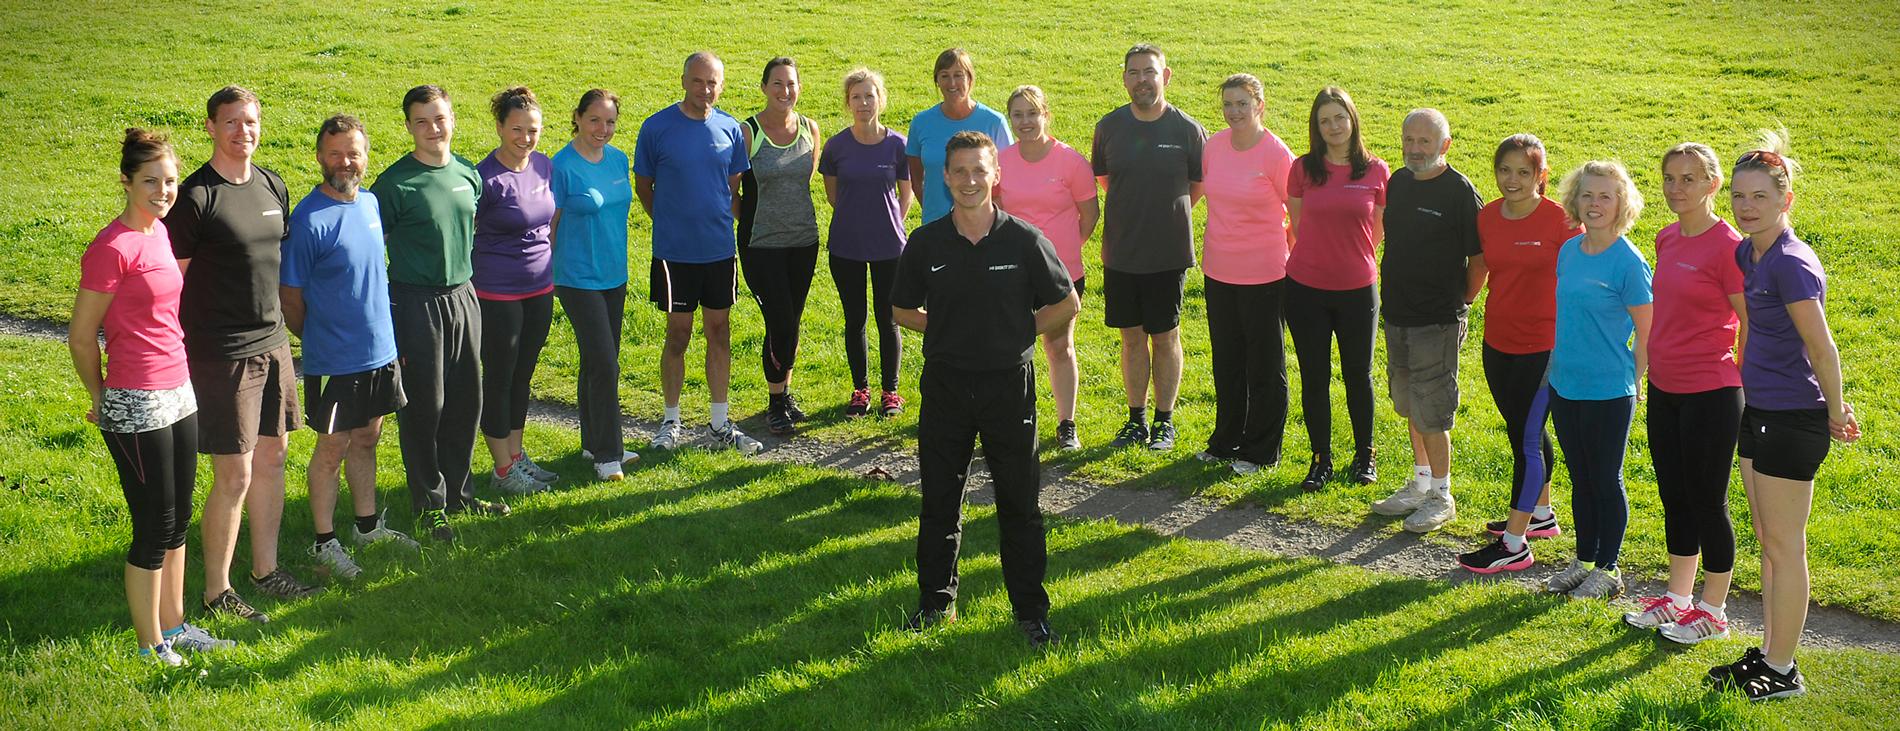 Jon Barnett Fitness | Fitness Classes | Personal Training | North Devon | Barnstaple | South Molton